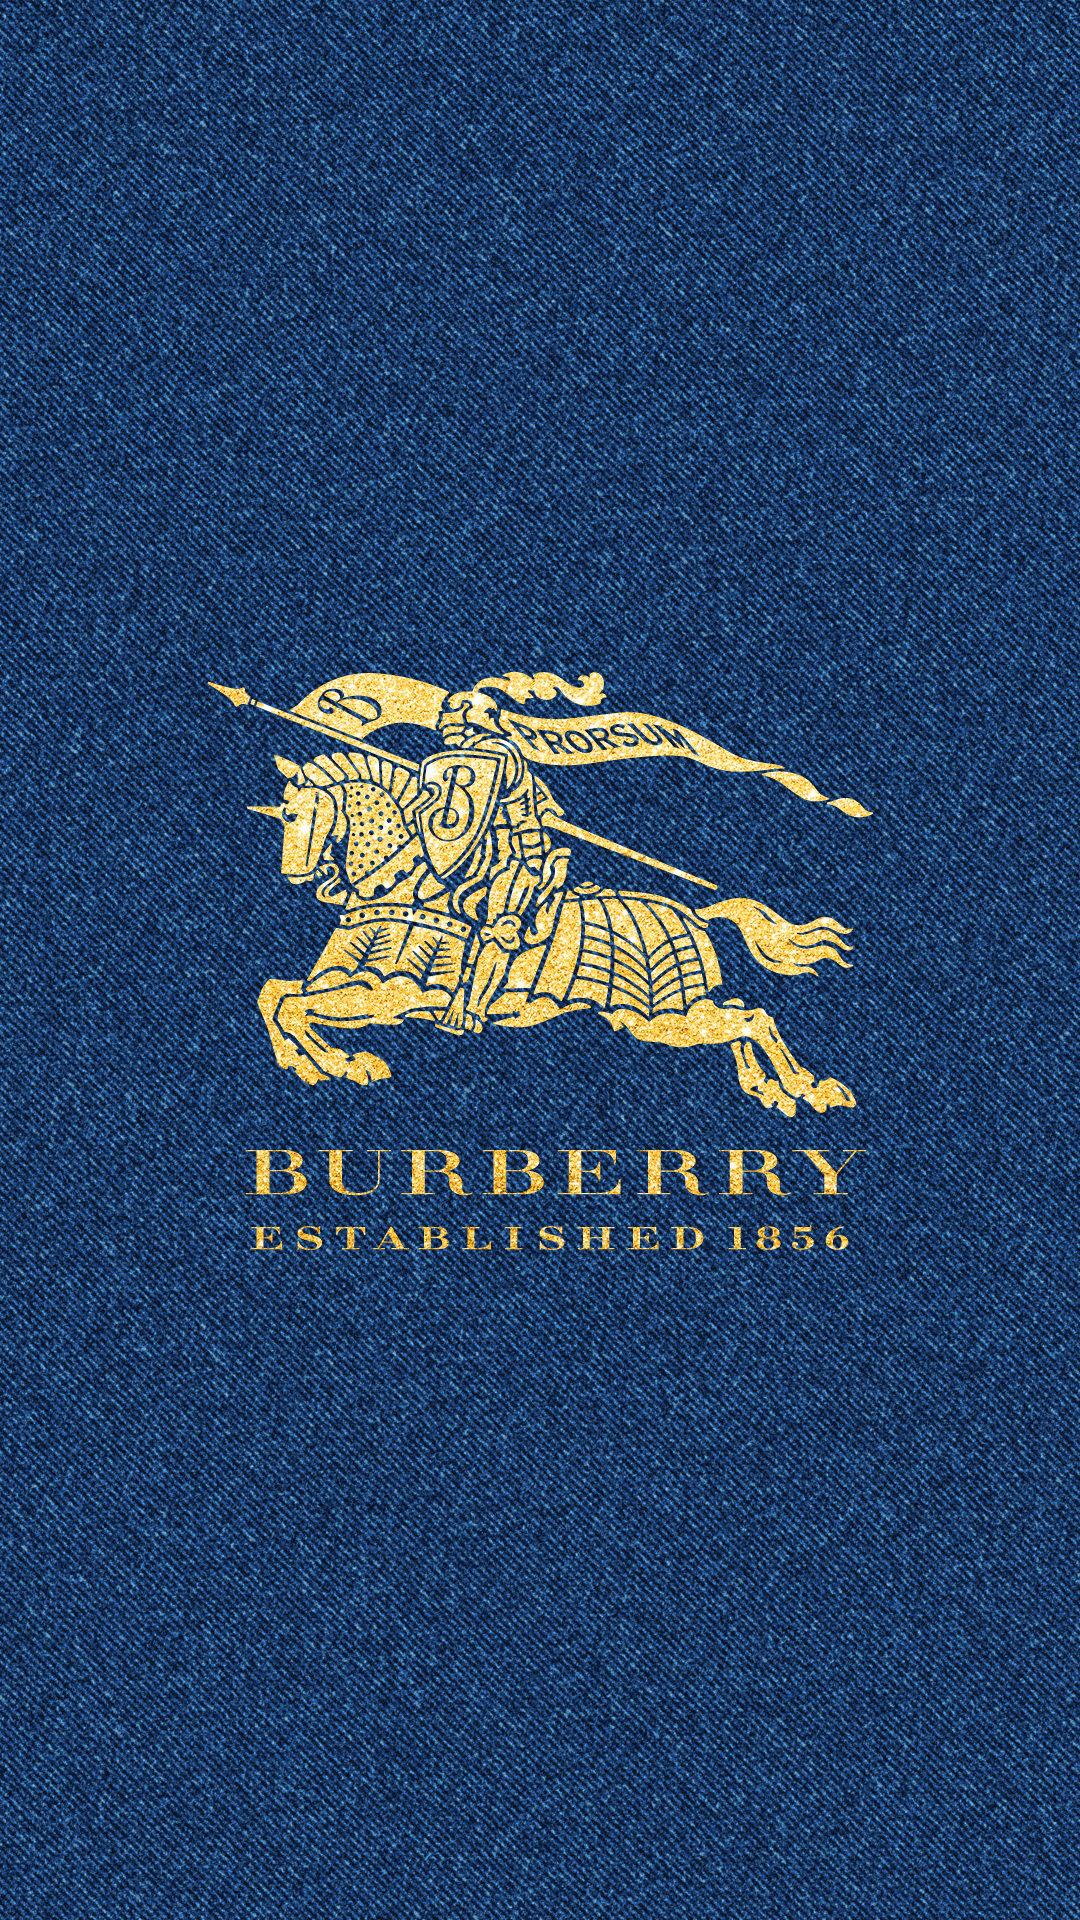 Burberry Iphone Wallpaper バーバリー ゴールドロゴ&デニム めちゃ人気 Iphone壁紙dj